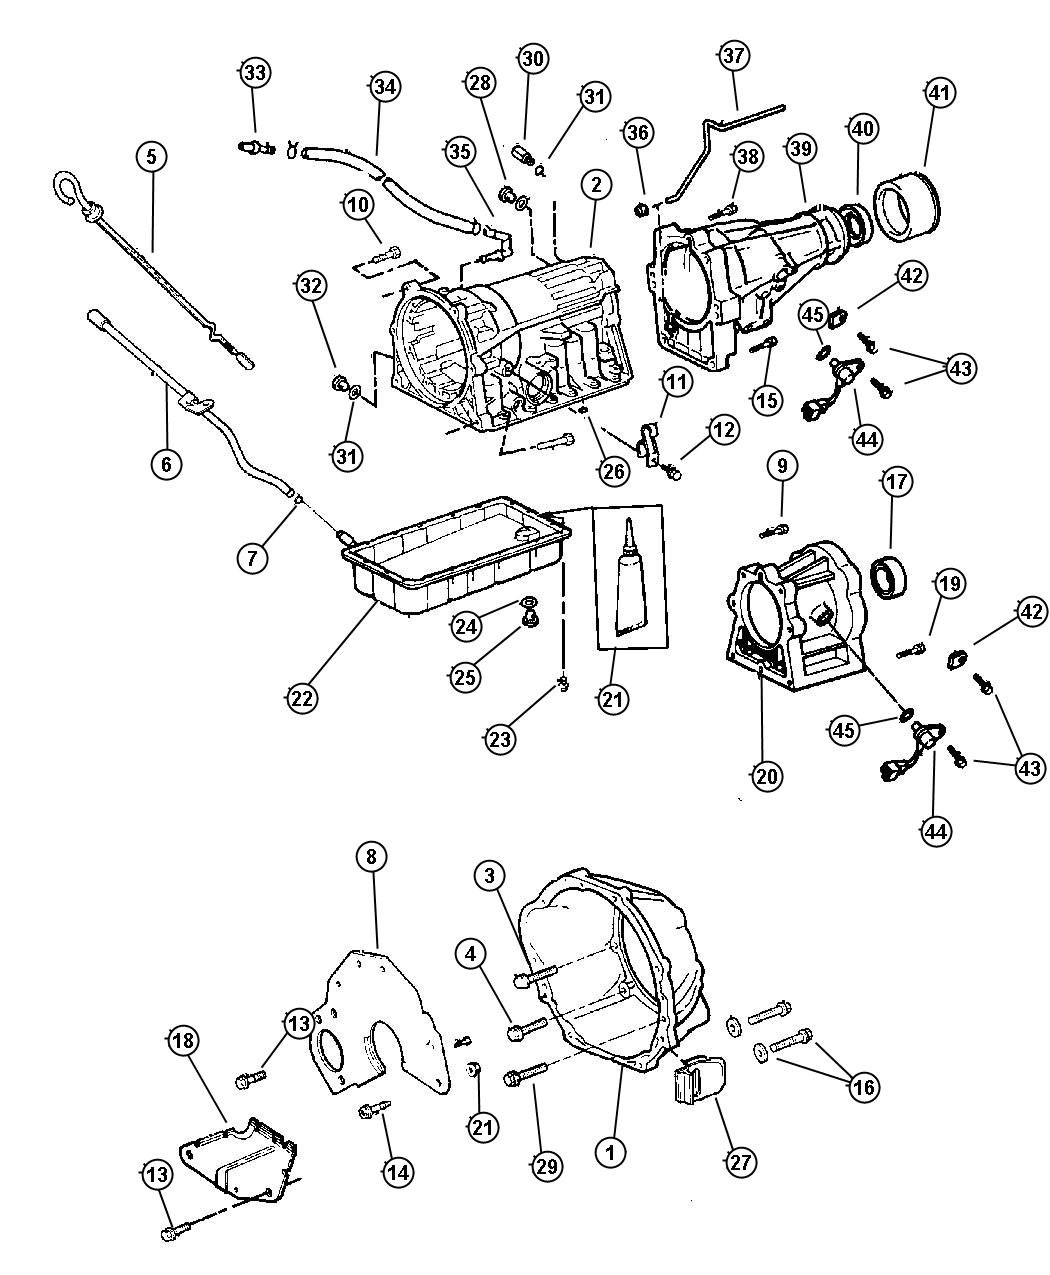 1997 Jeep Cherokee Pan. Transmission oil. 52104180ab